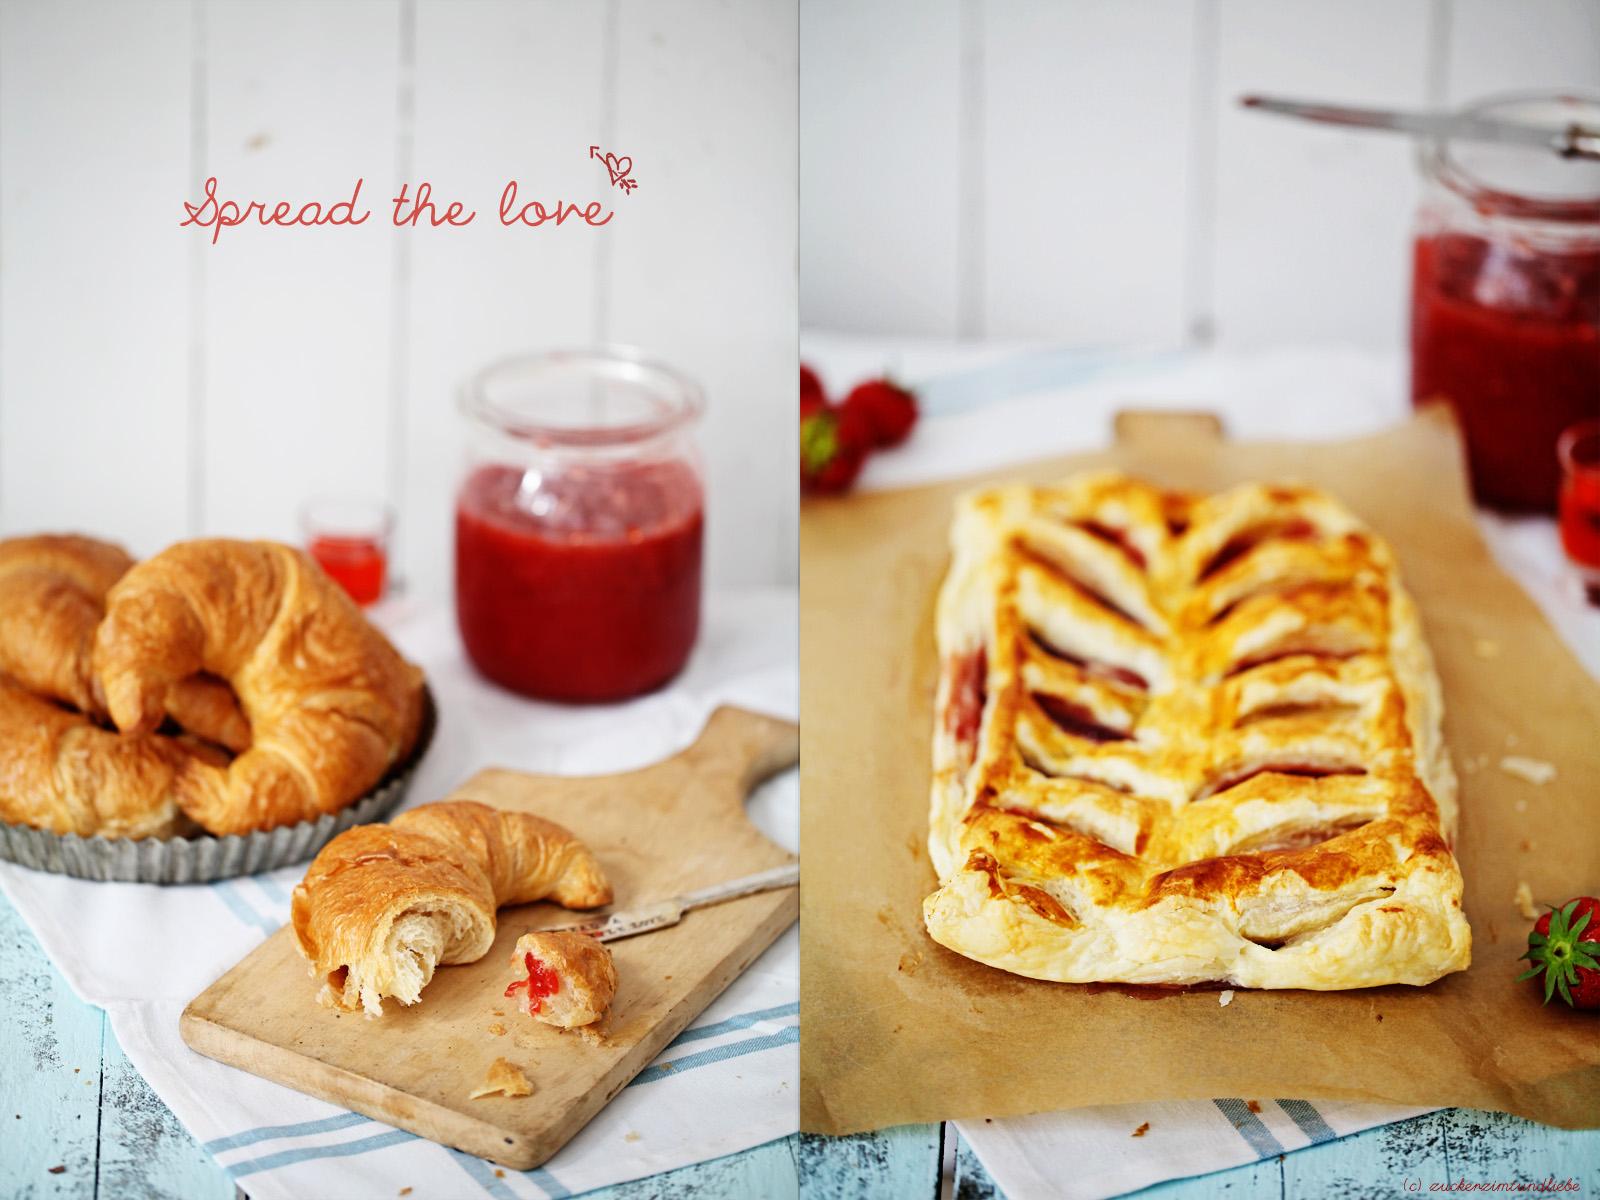 erdbeer aperol marmelade zu croissants oder f r die schnelle mascarpone erdbeer aperol. Black Bedroom Furniture Sets. Home Design Ideas